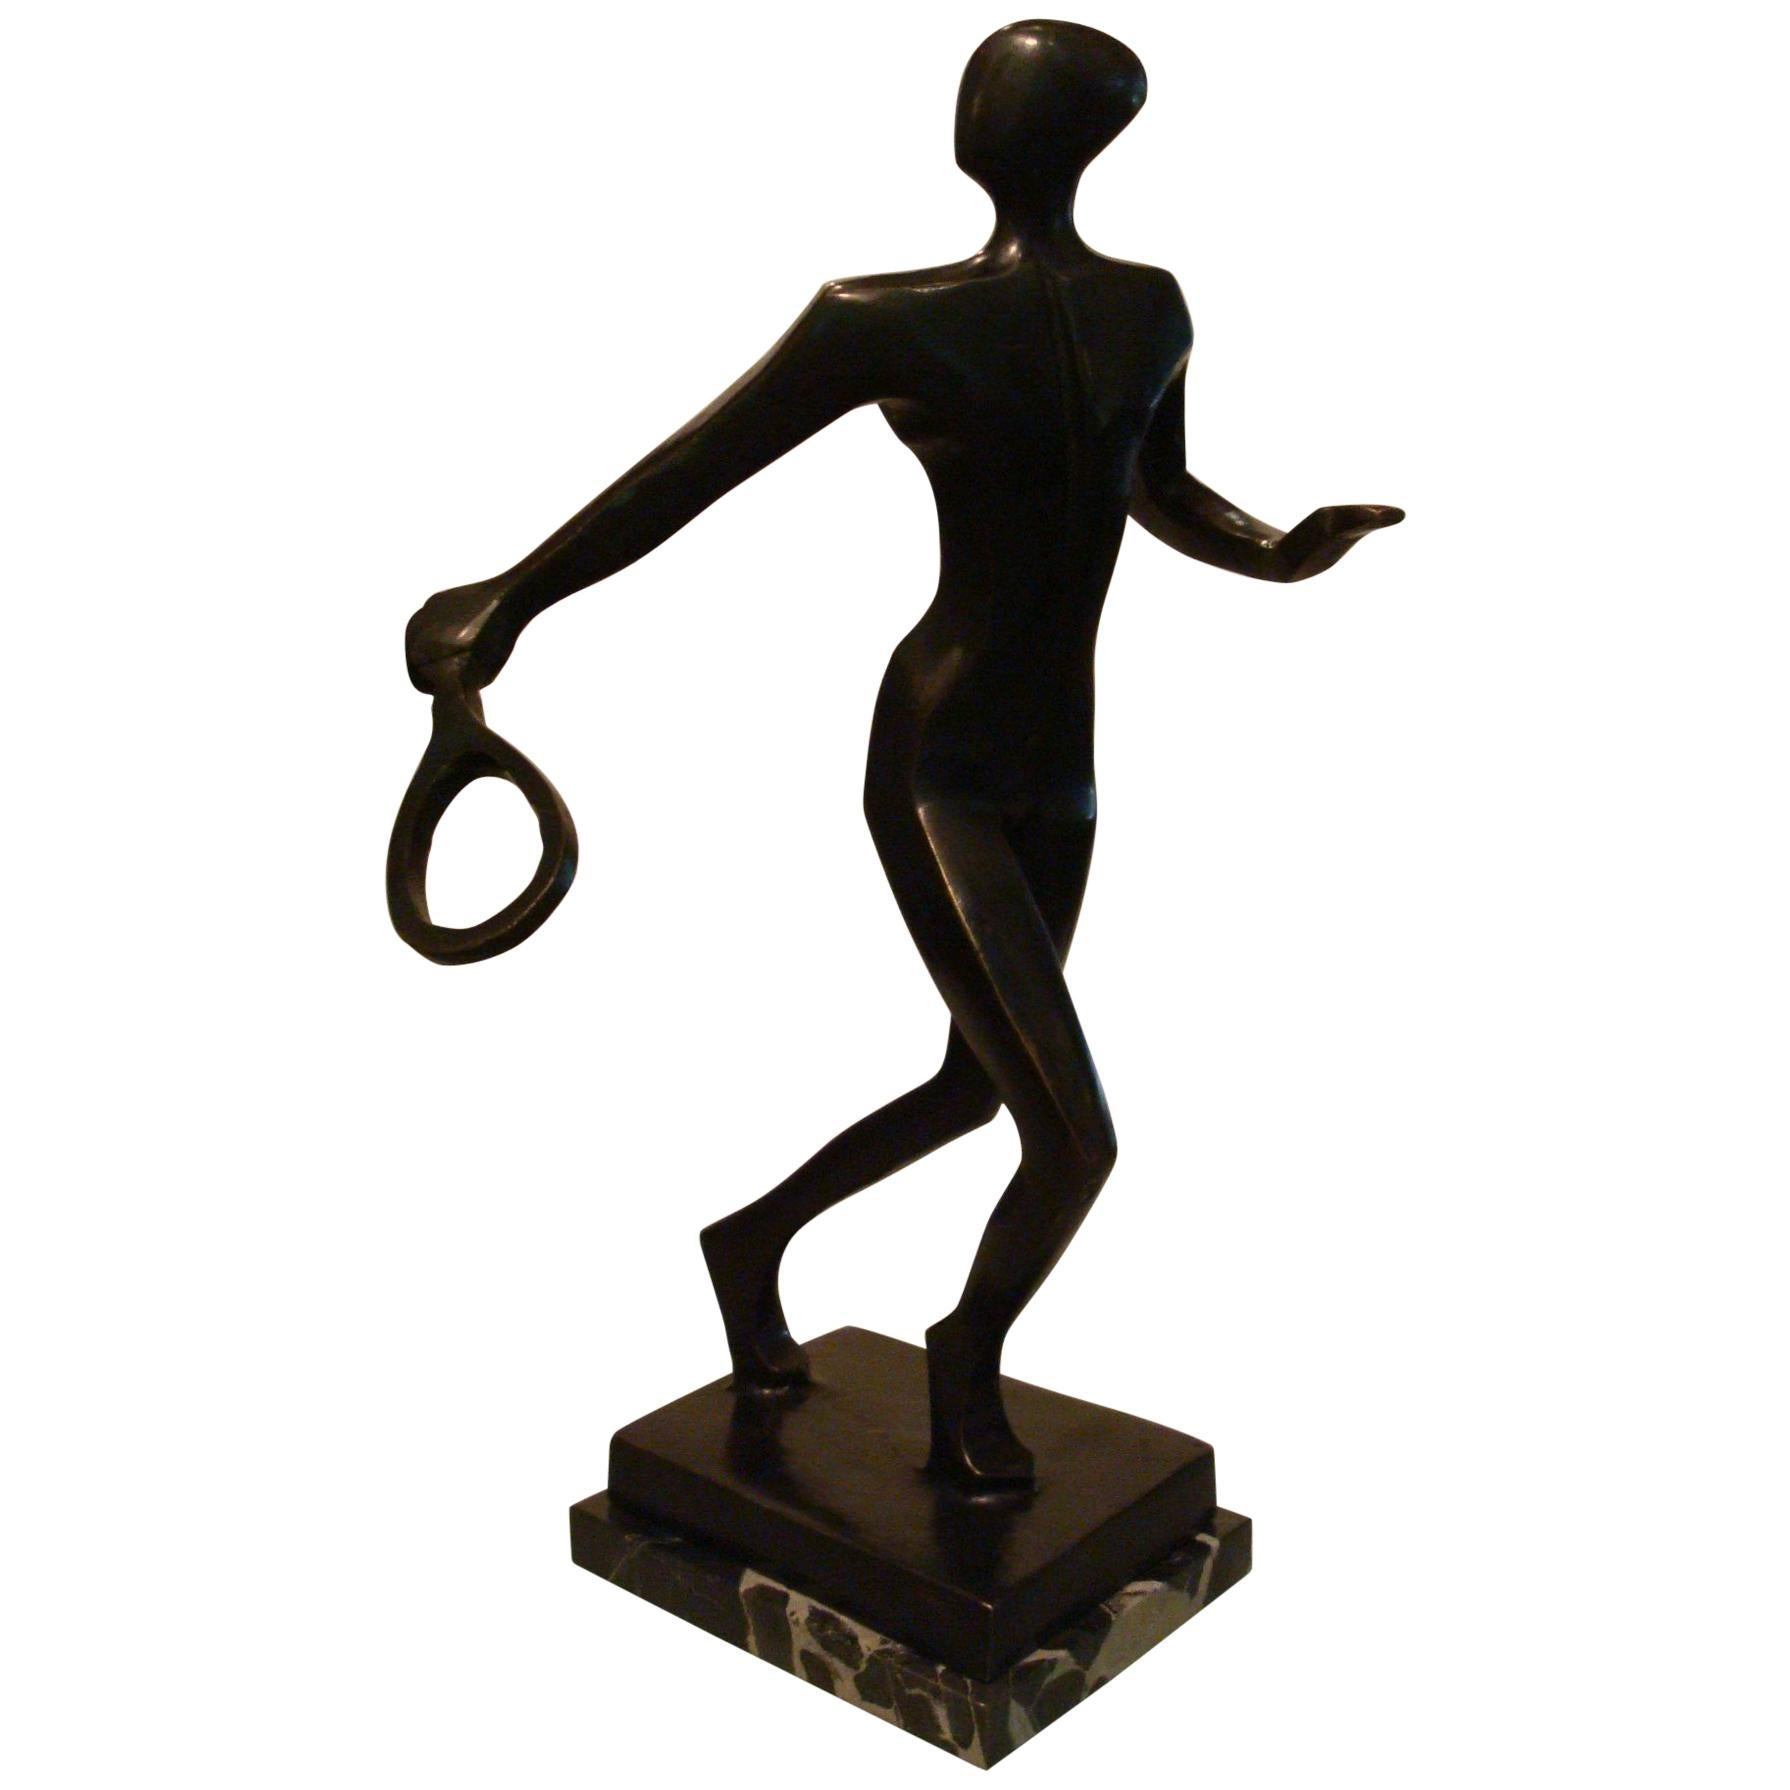 20th Century Tennis Player Bronze Sculpture / Trophy, Italy, 1930s